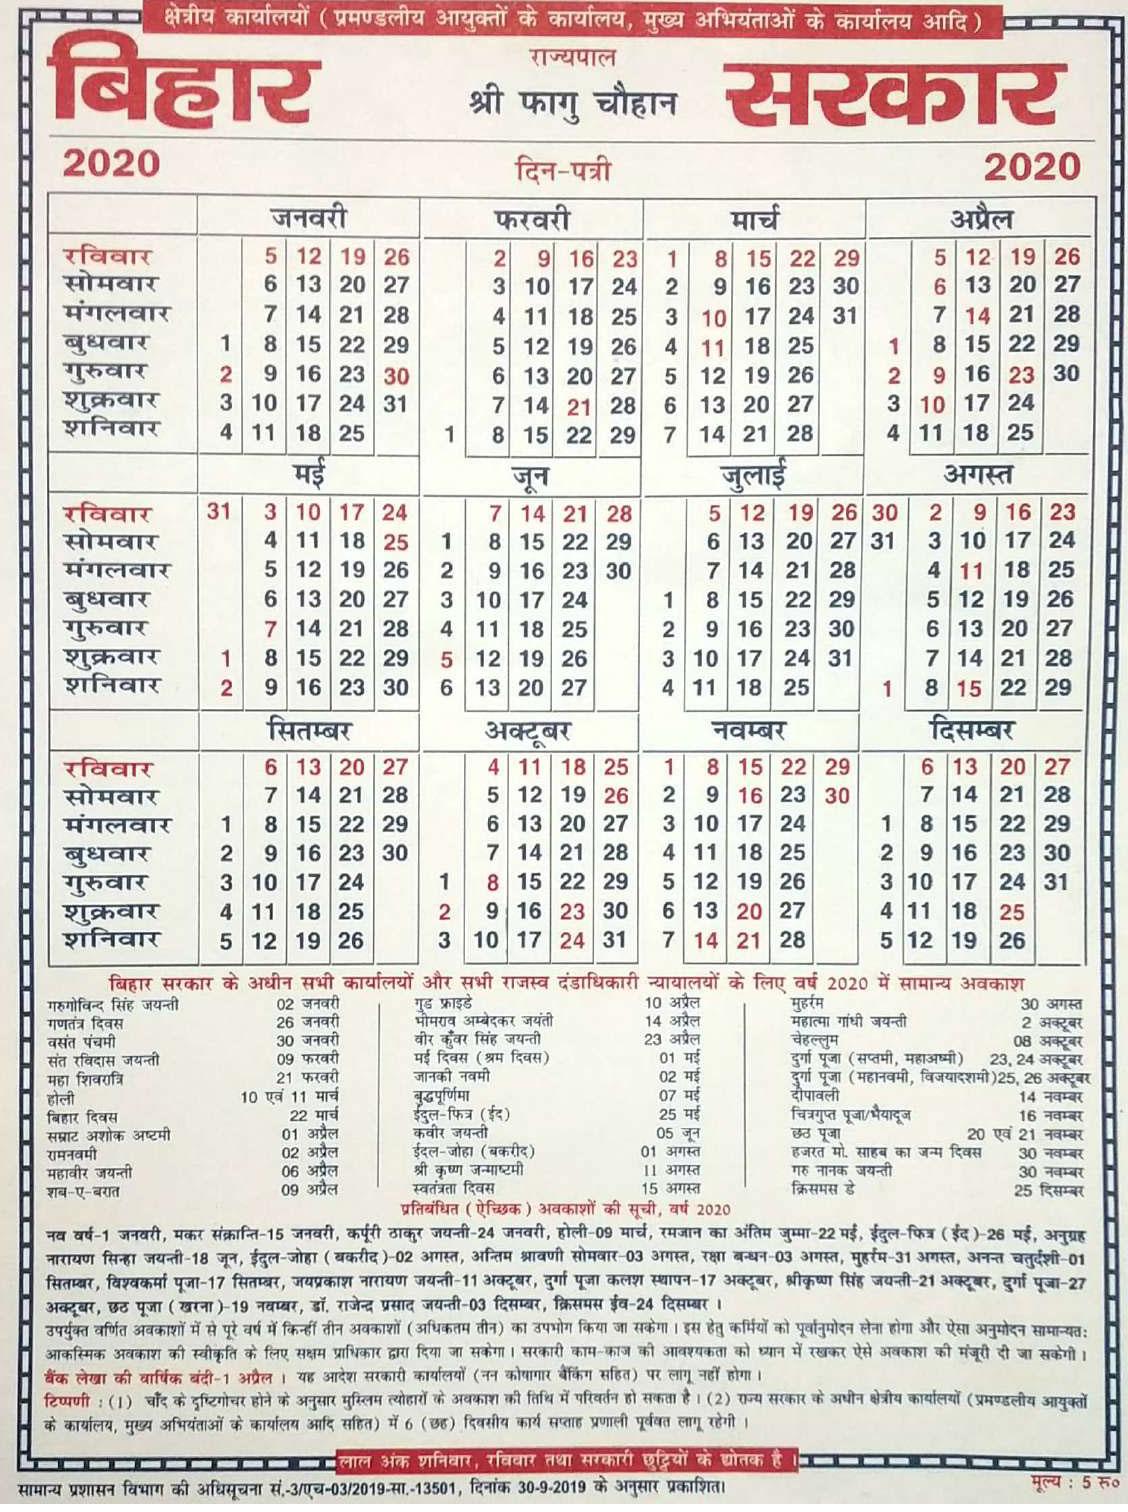 Bihar Sarkar Calendar 2021 Pdf | Seg within Bihar Government Calander